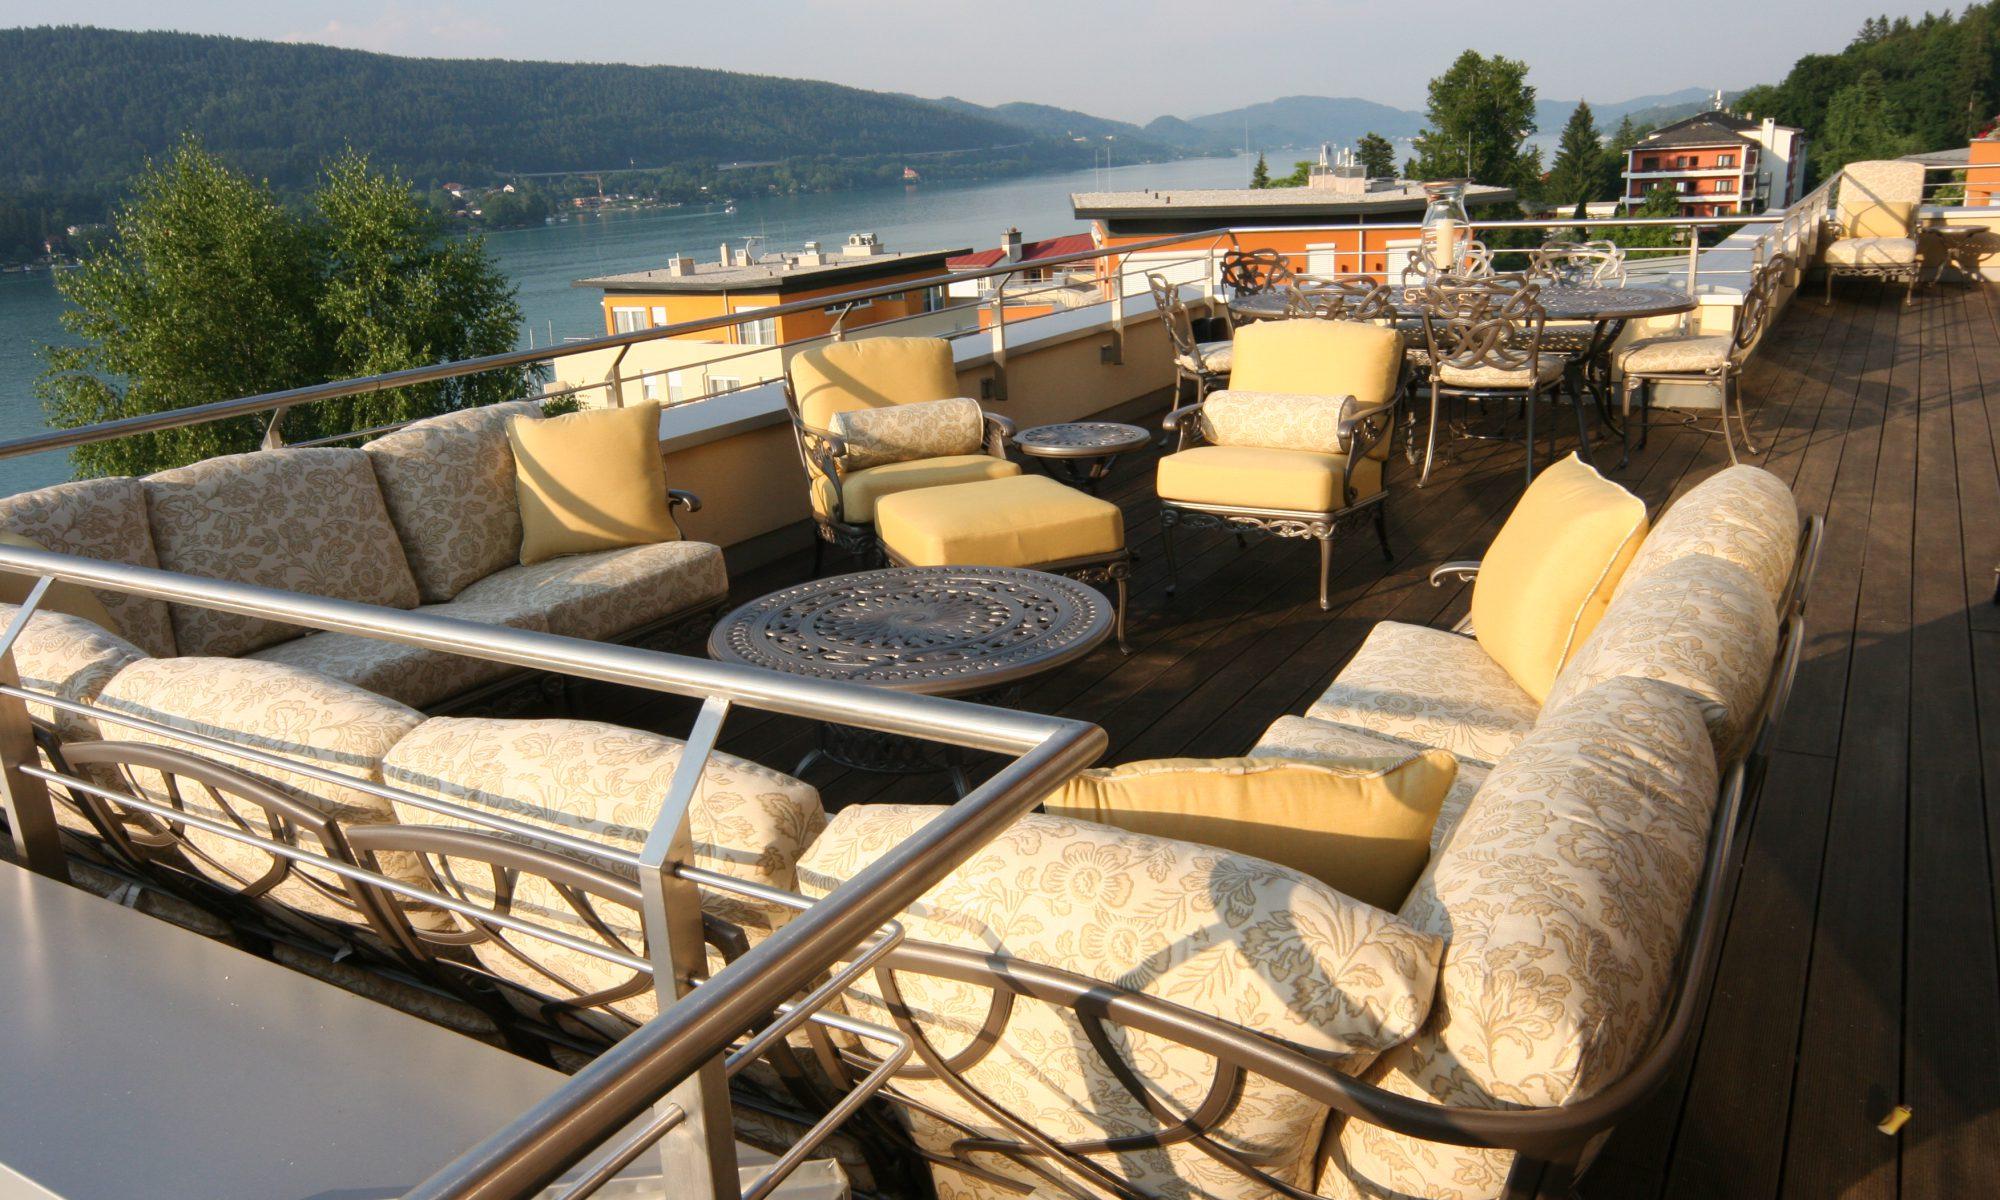 Austria Penthouse balcony view